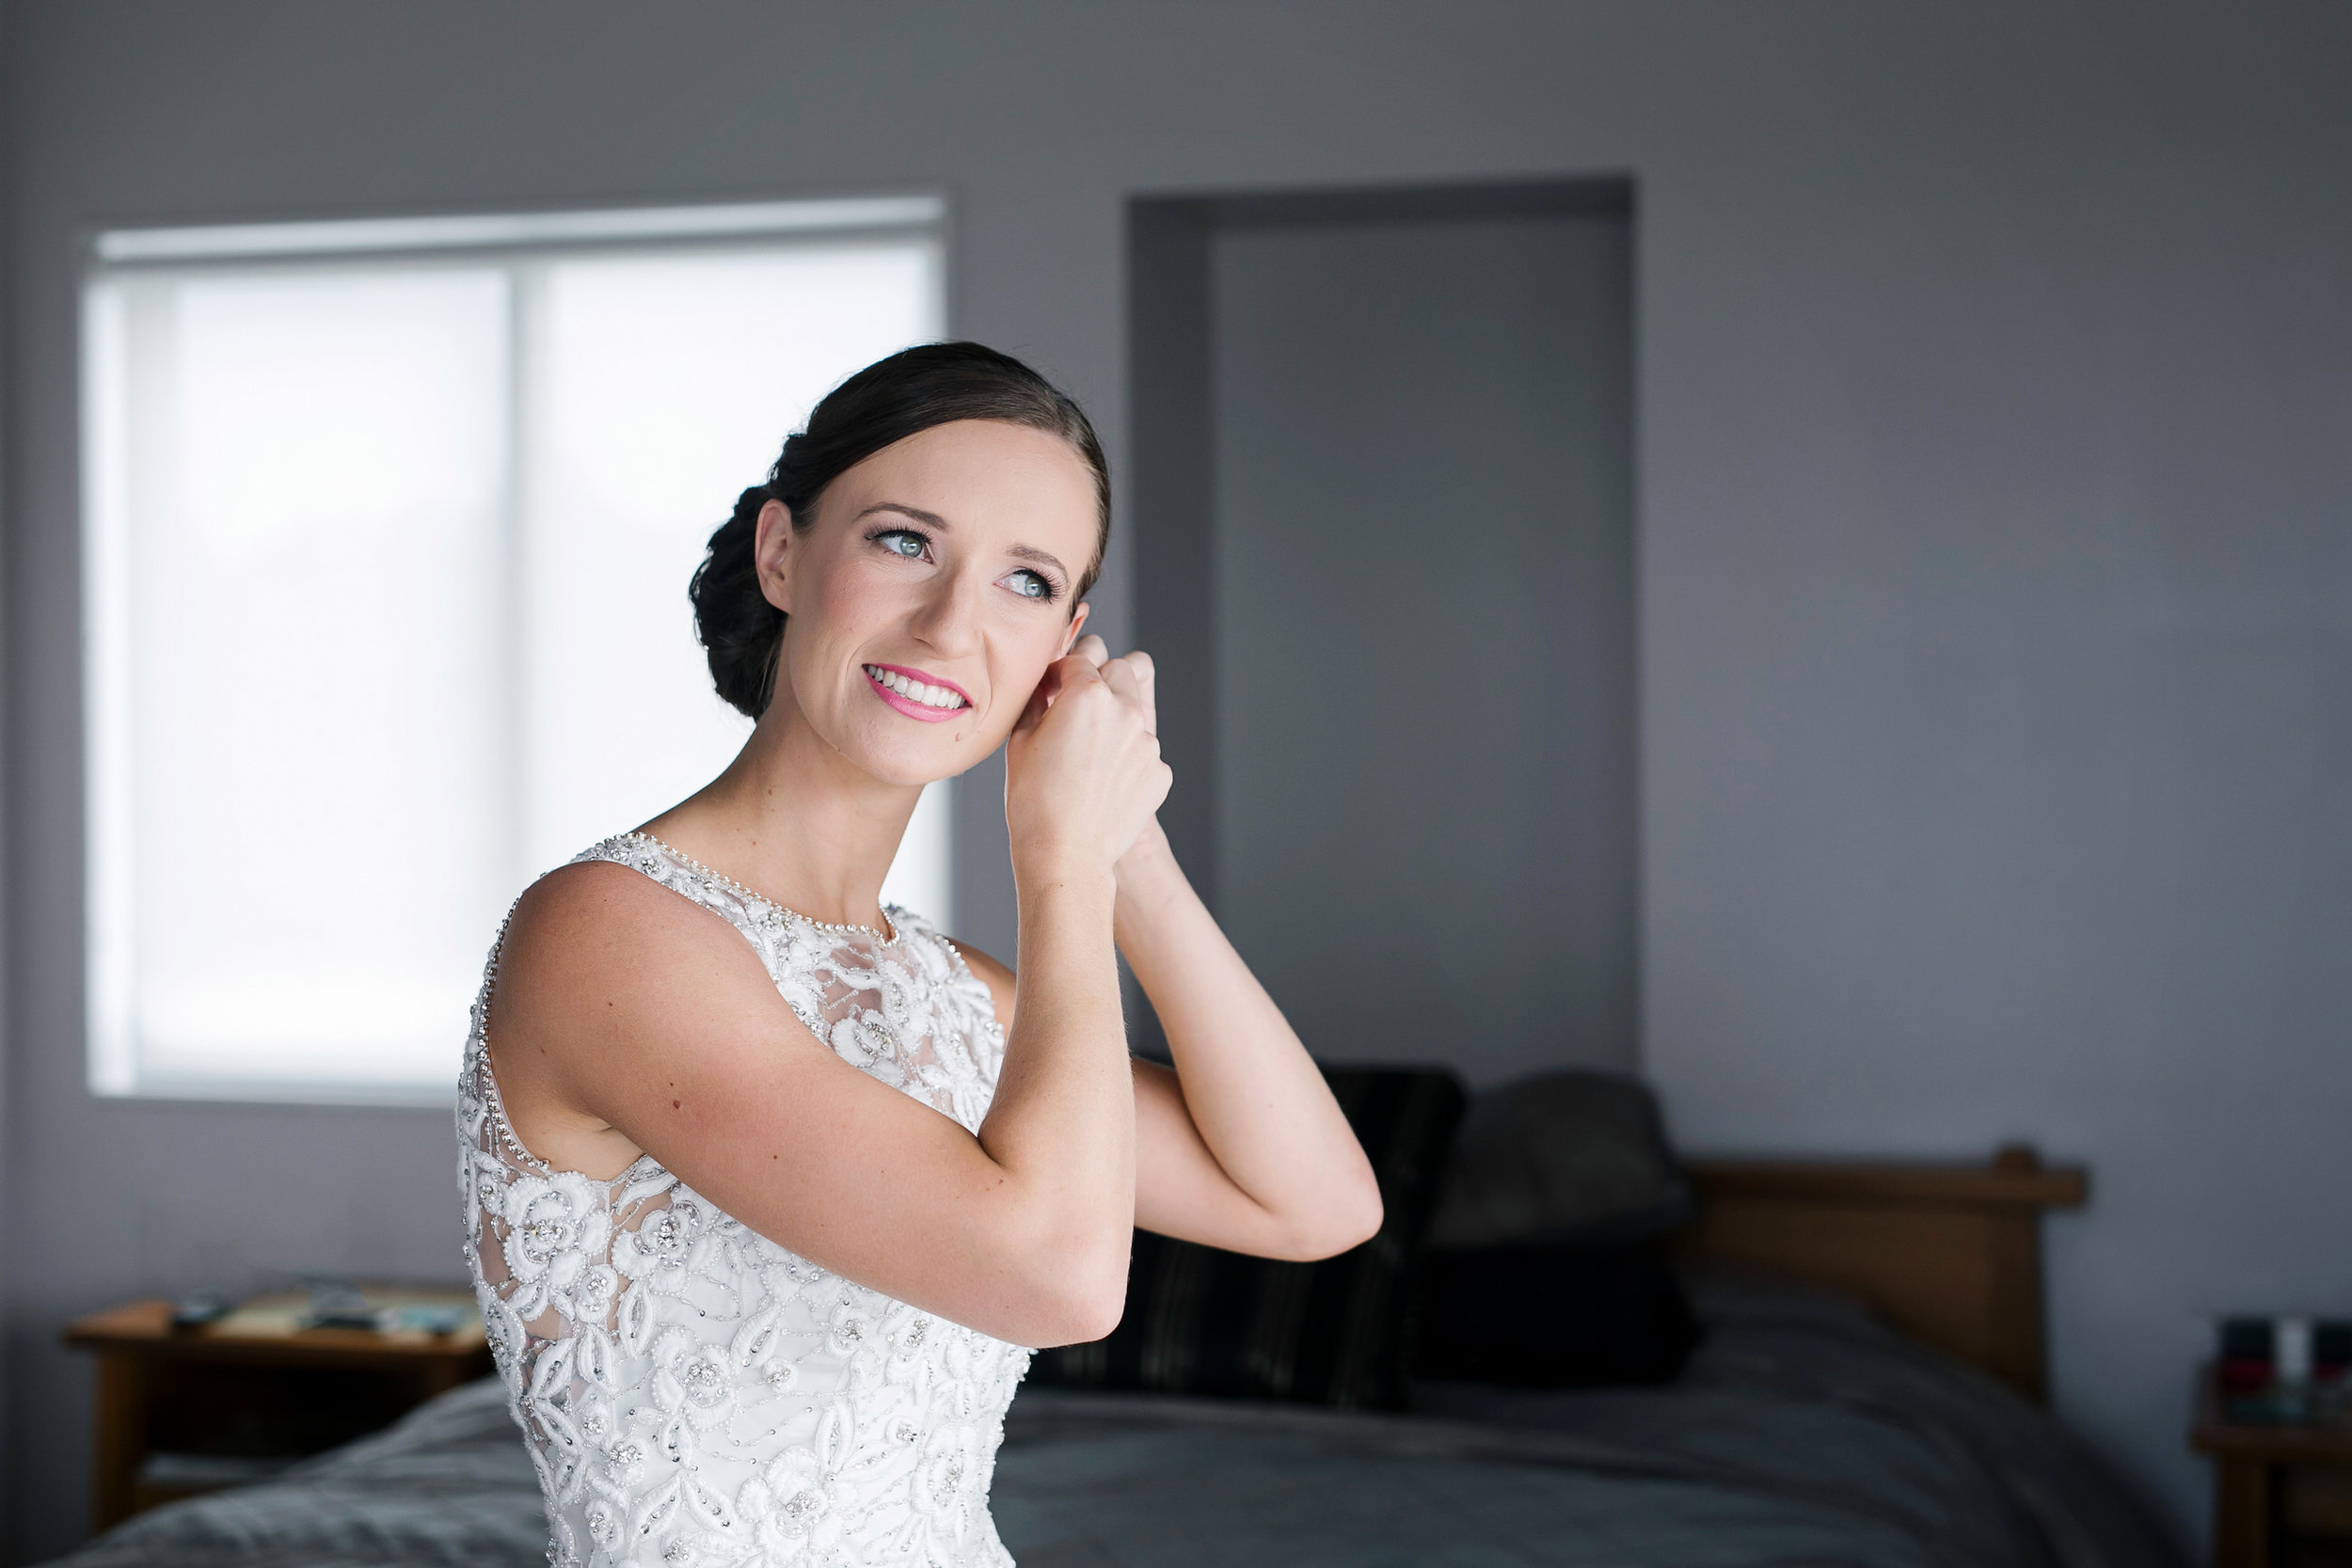 Martinborough-Poppies-Wedding-Caine-Eloise-Toni-Larsen-0028.jpg